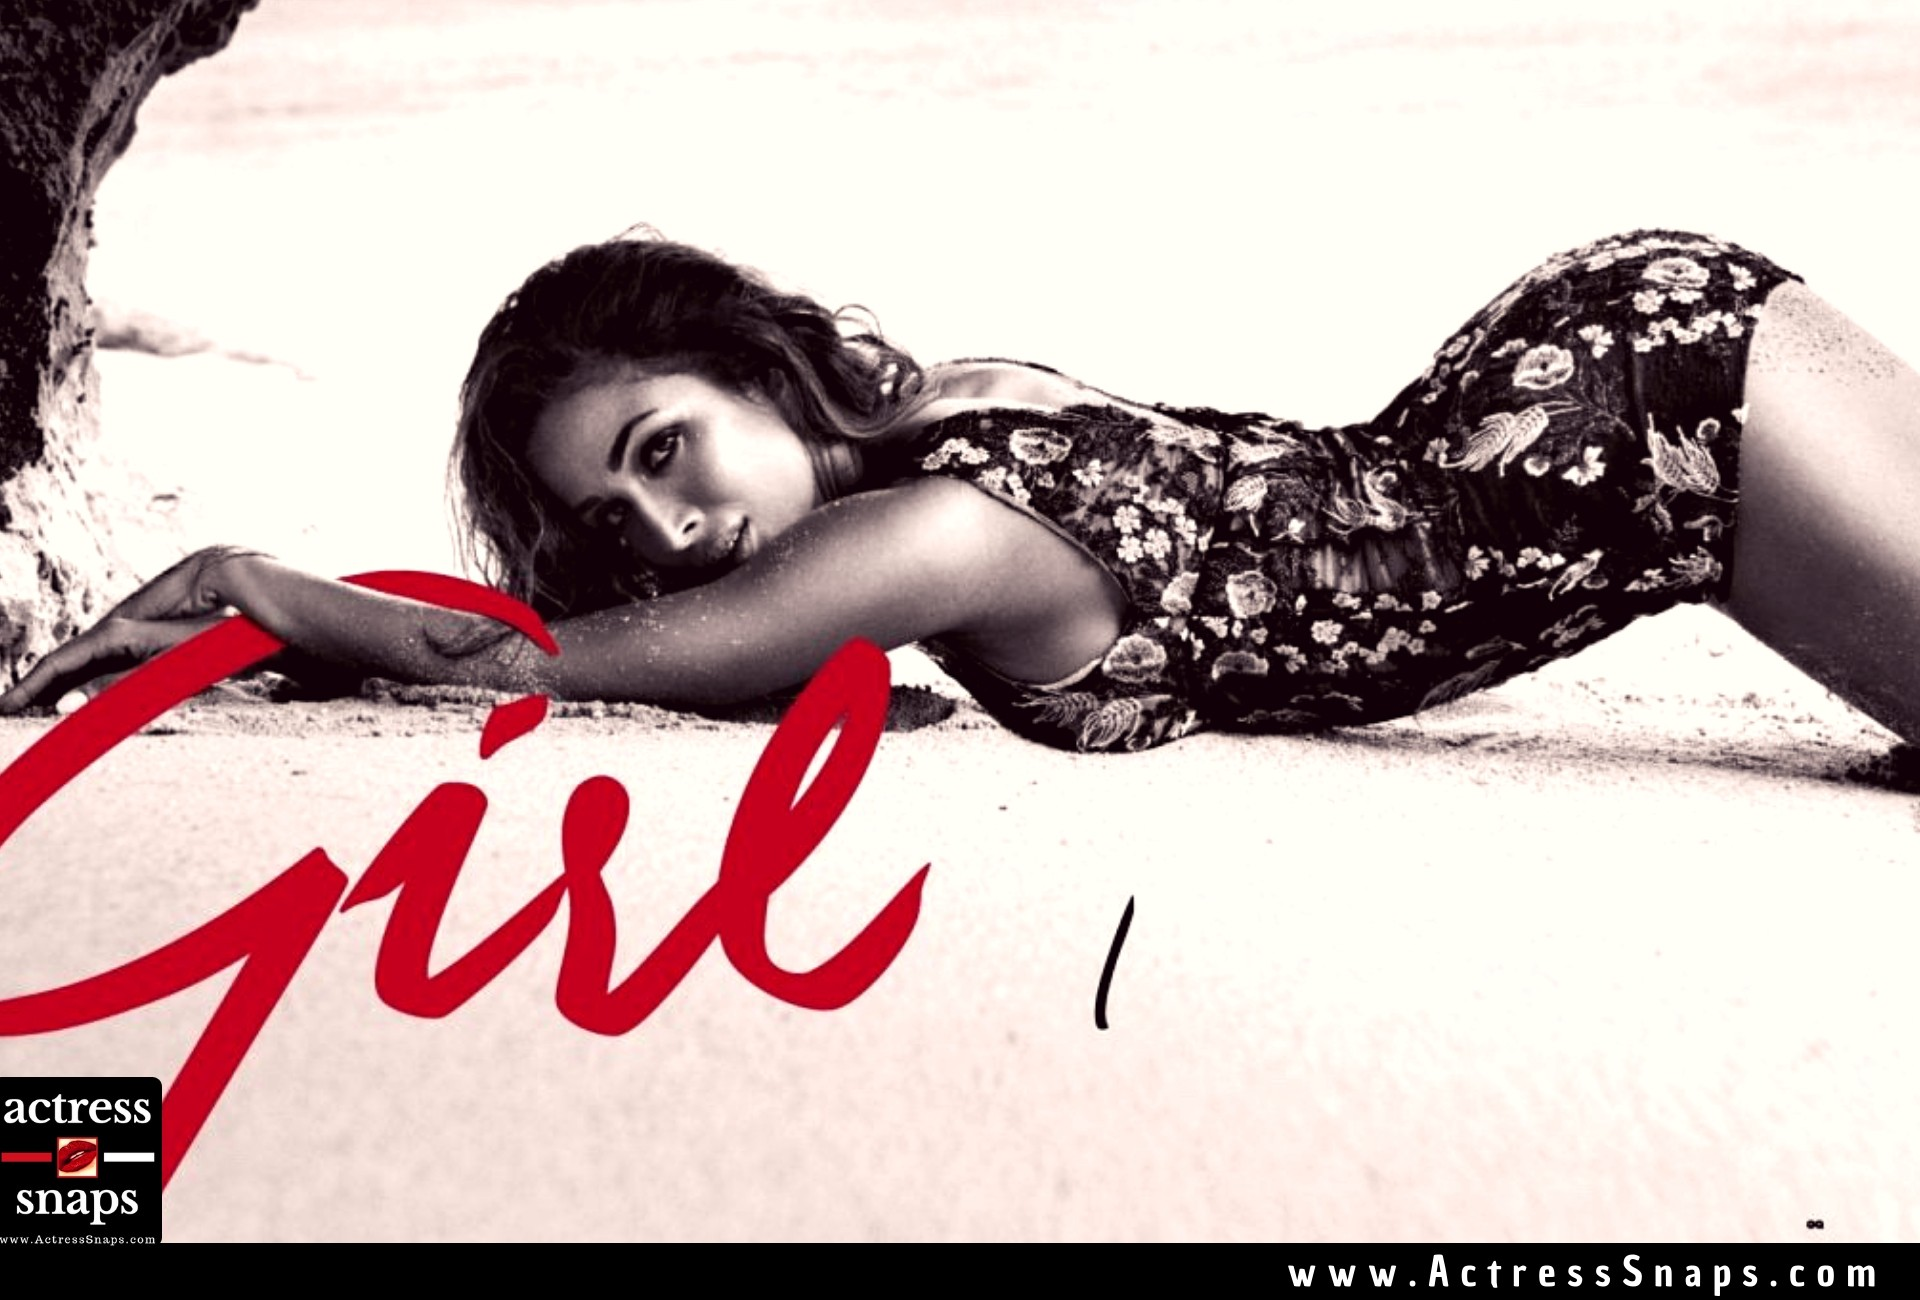 Malaika Arora - Sexy GQ magazine Scans #MalaikaArora #Bollywood